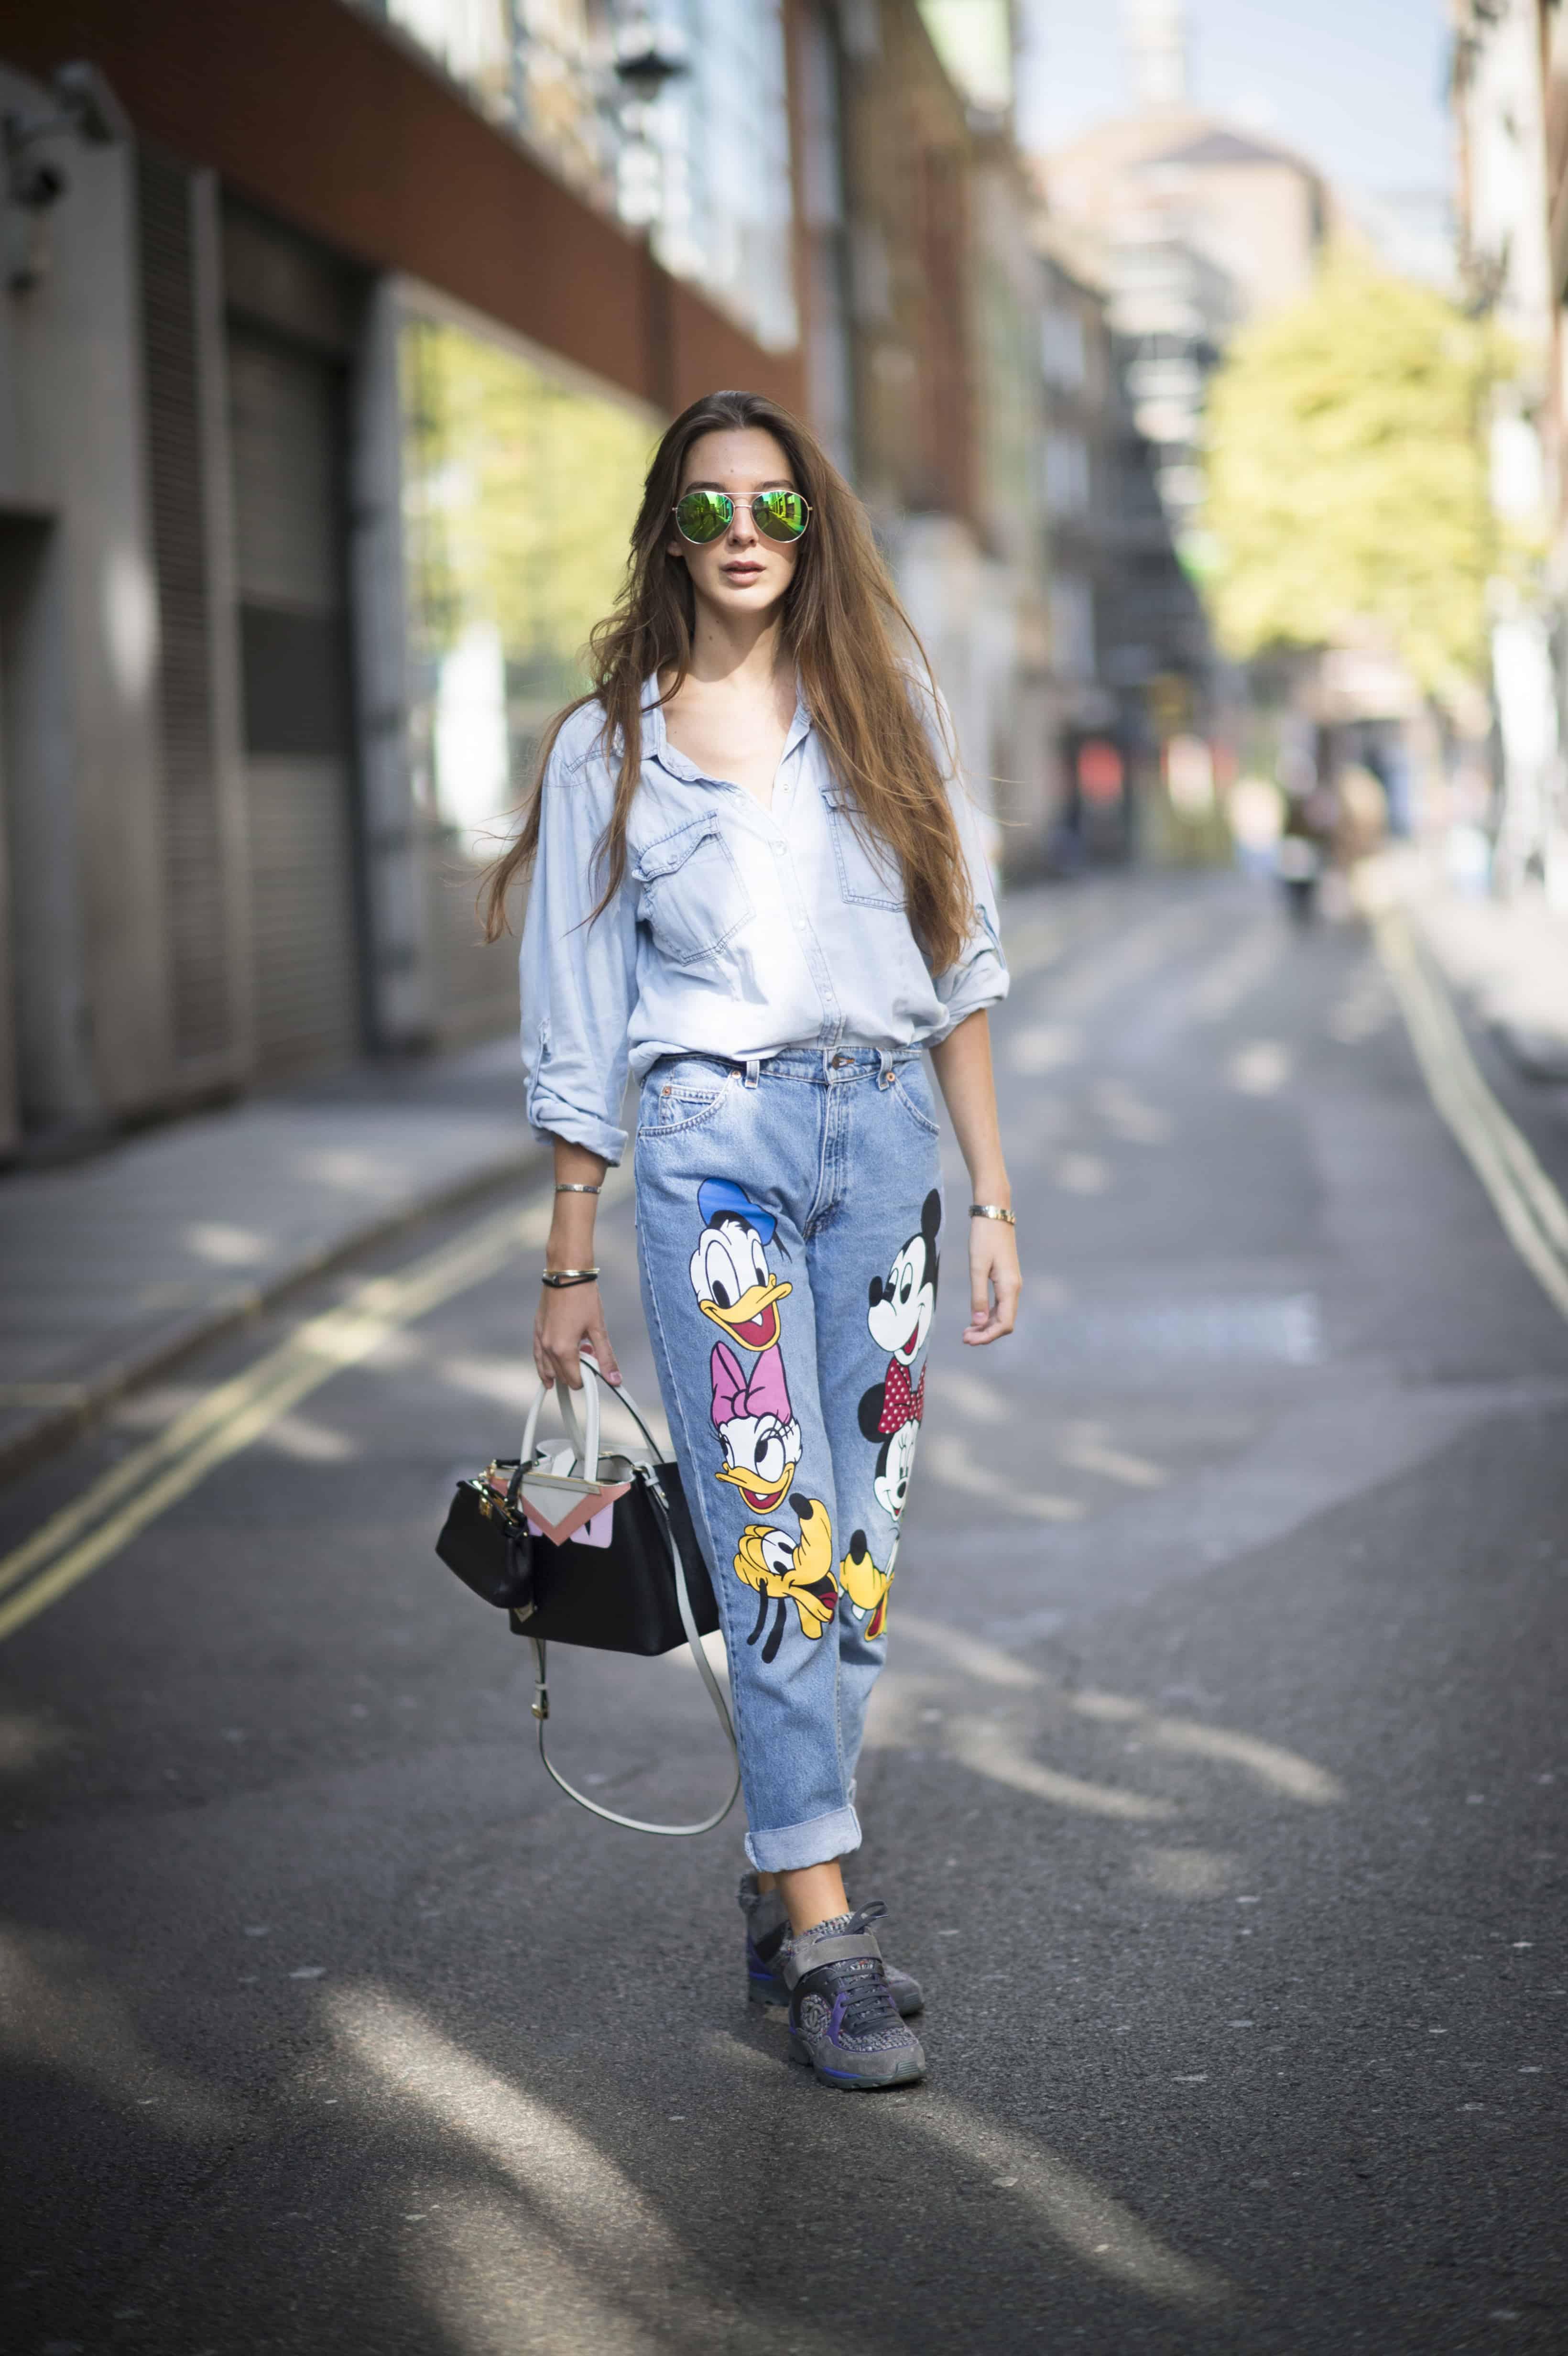 disney-fashion-trend-14